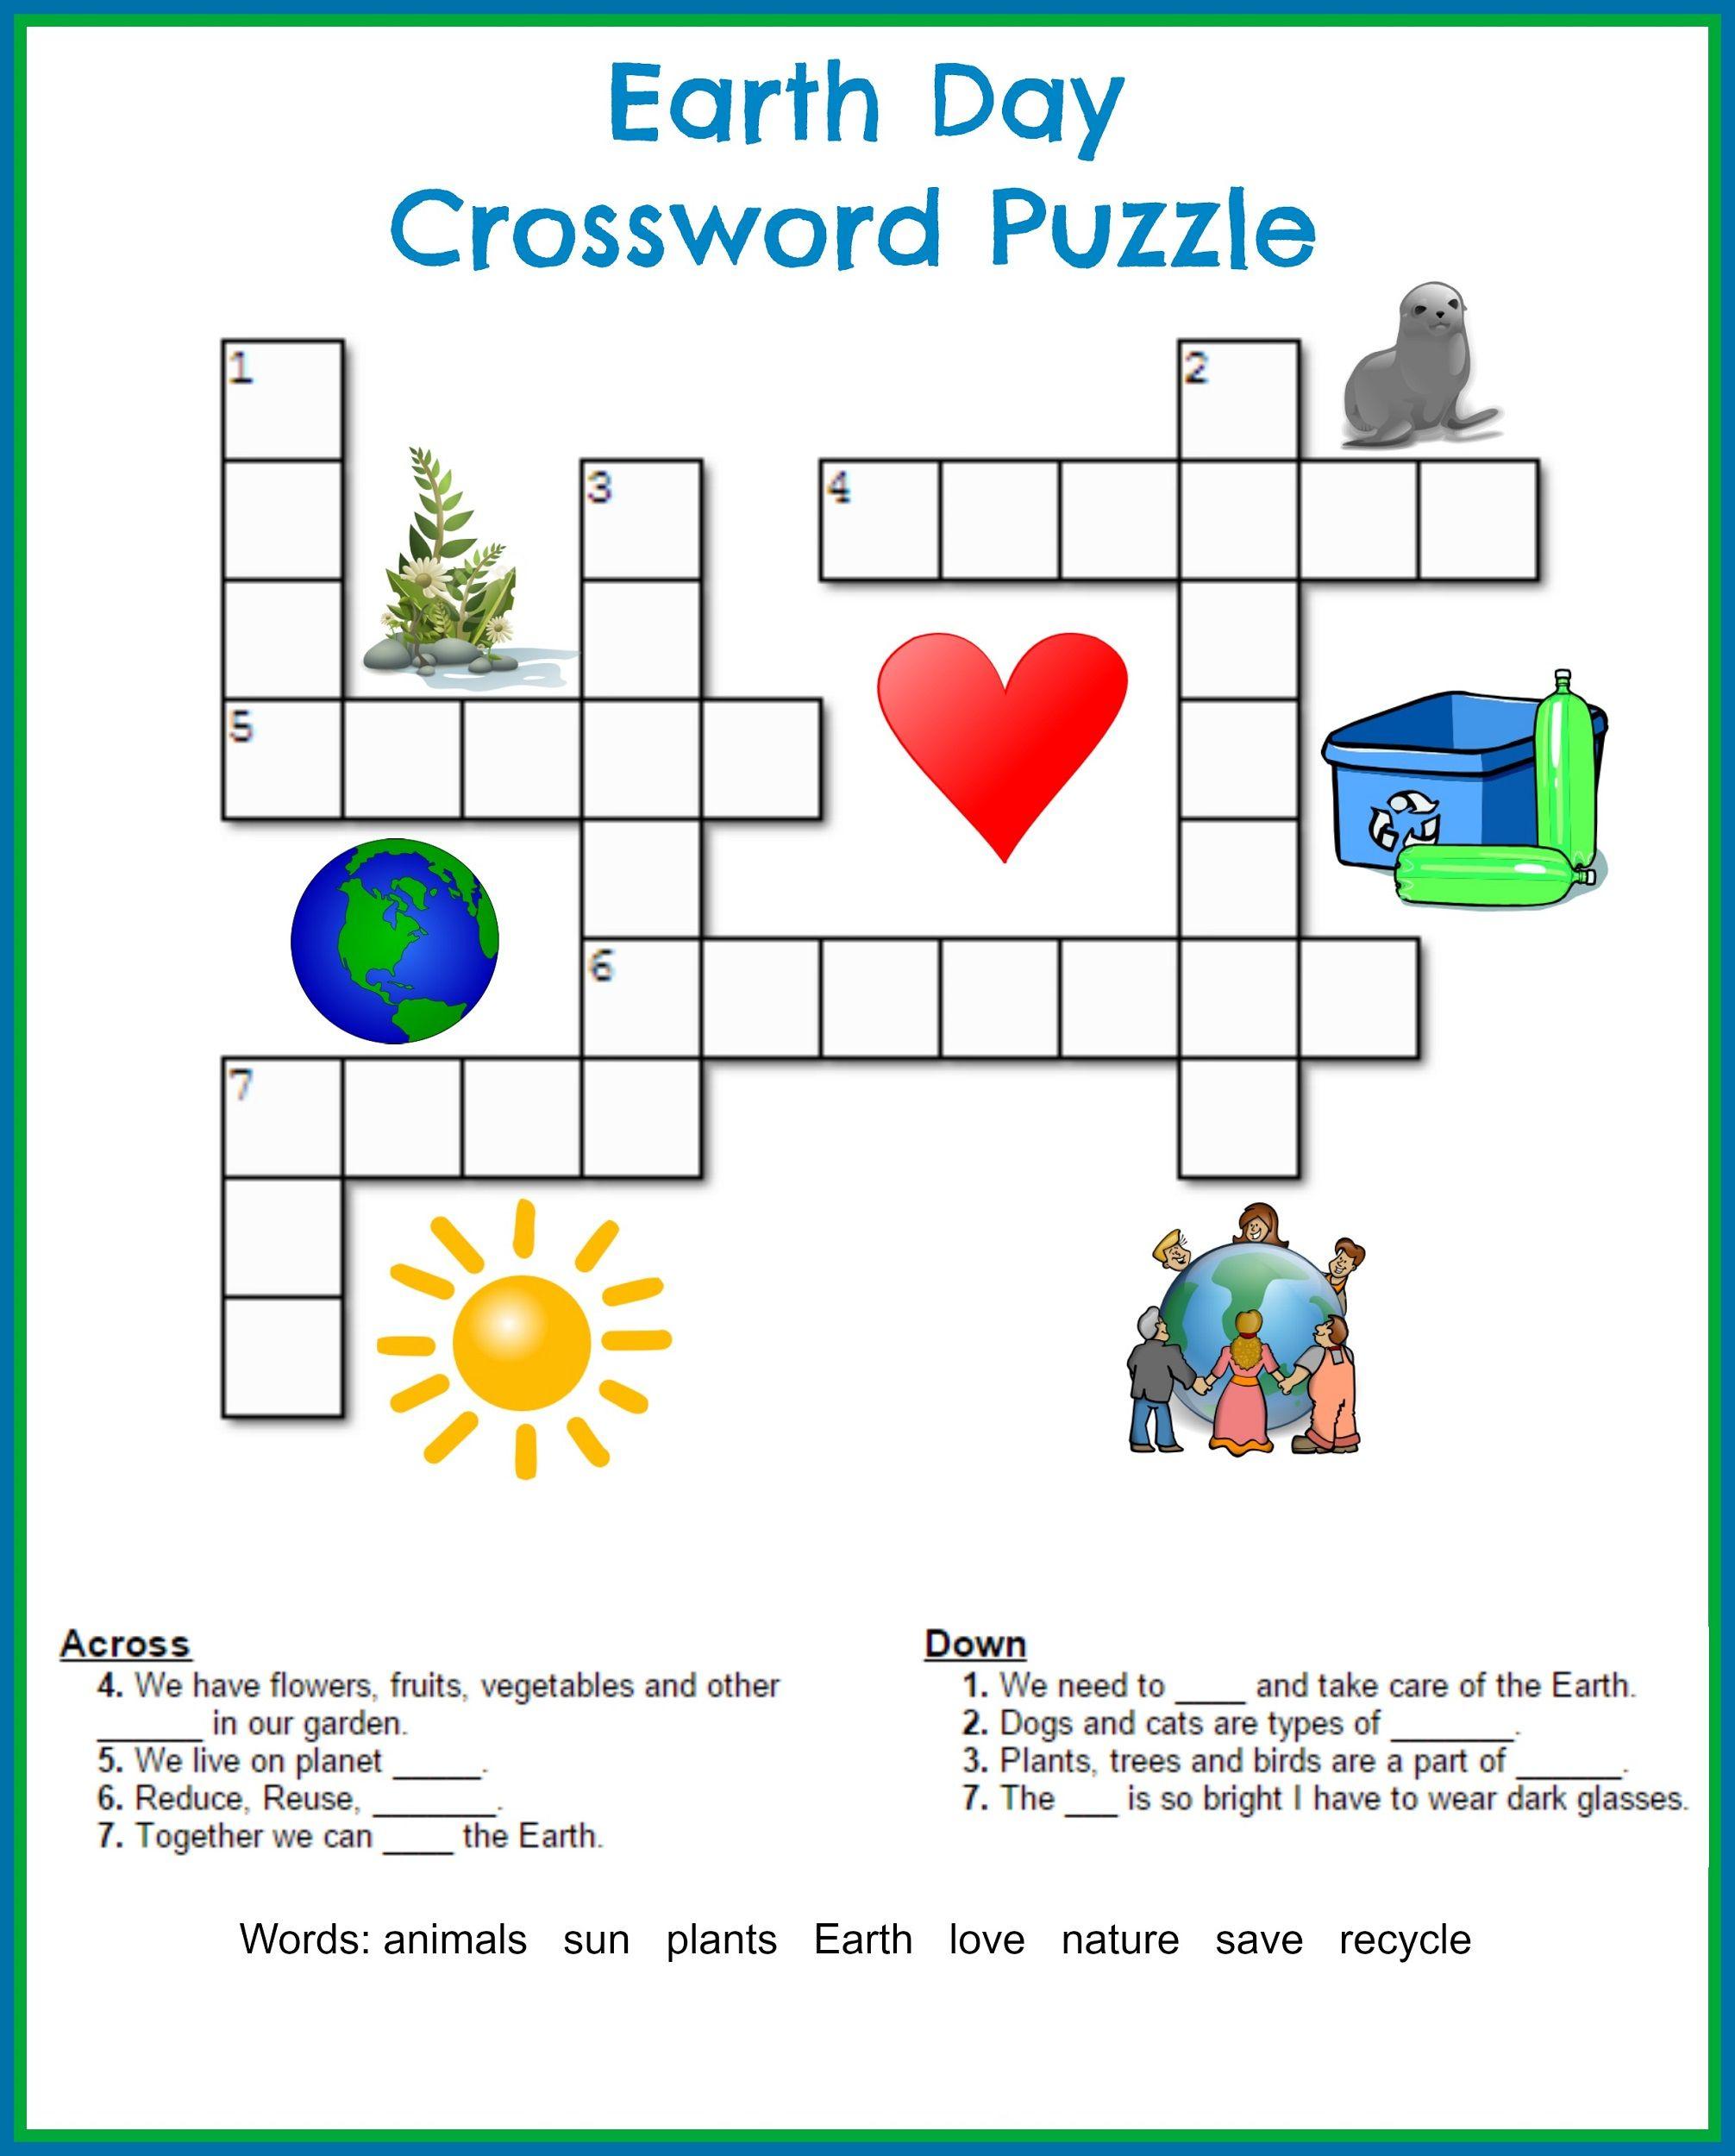 Printable Crossword Puzzles Kids | Crossword Puzzles On Earth - Printable Crossword Puzzles For 5Th Graders